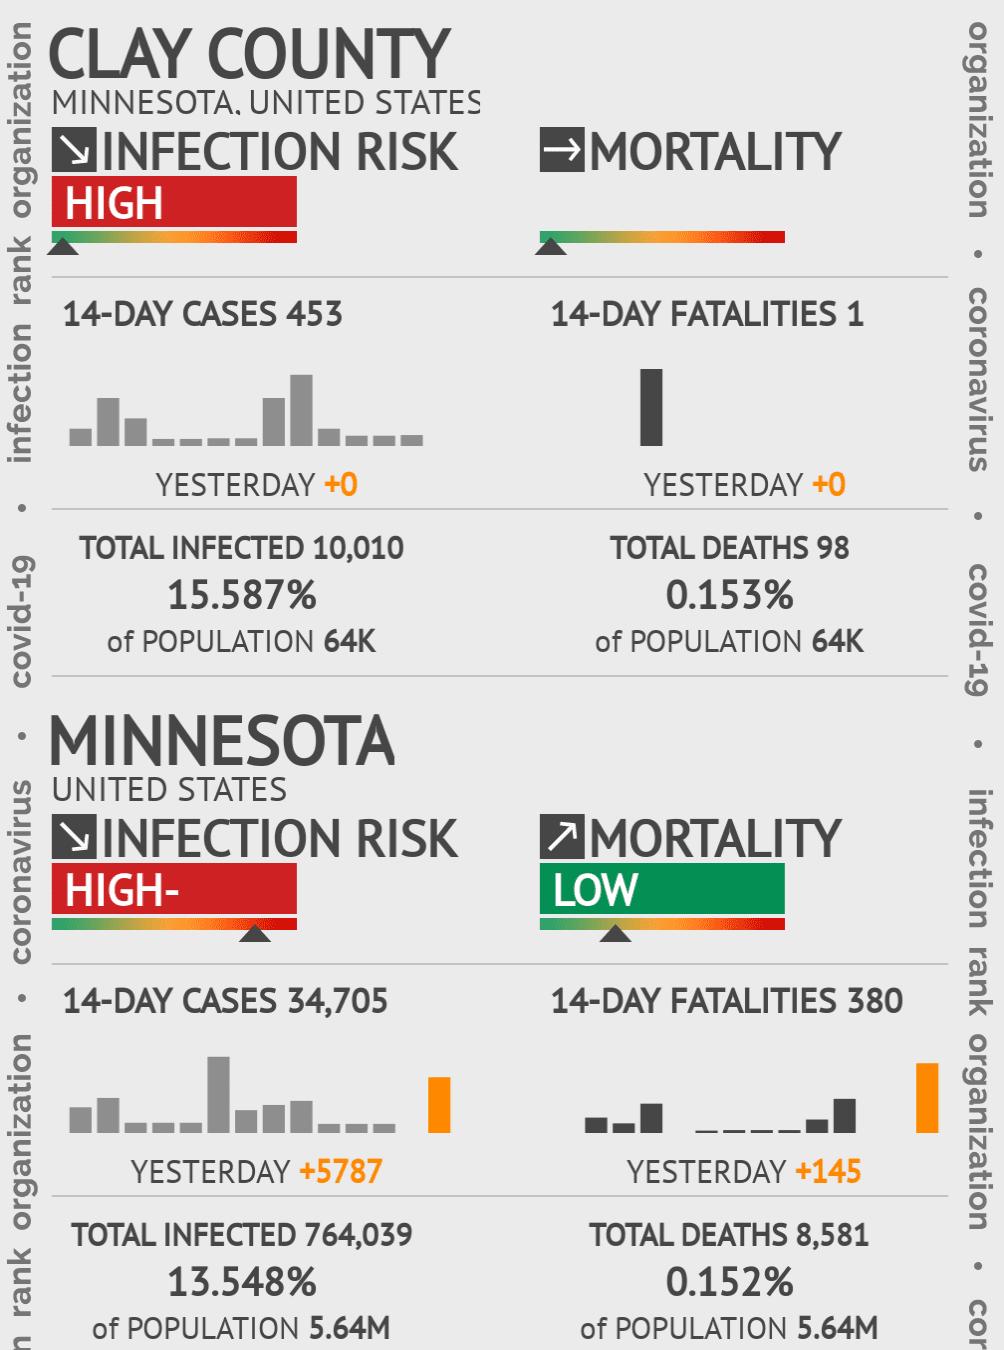 Clay County Coronavirus Covid-19 Risk of Infection on February 23, 2021